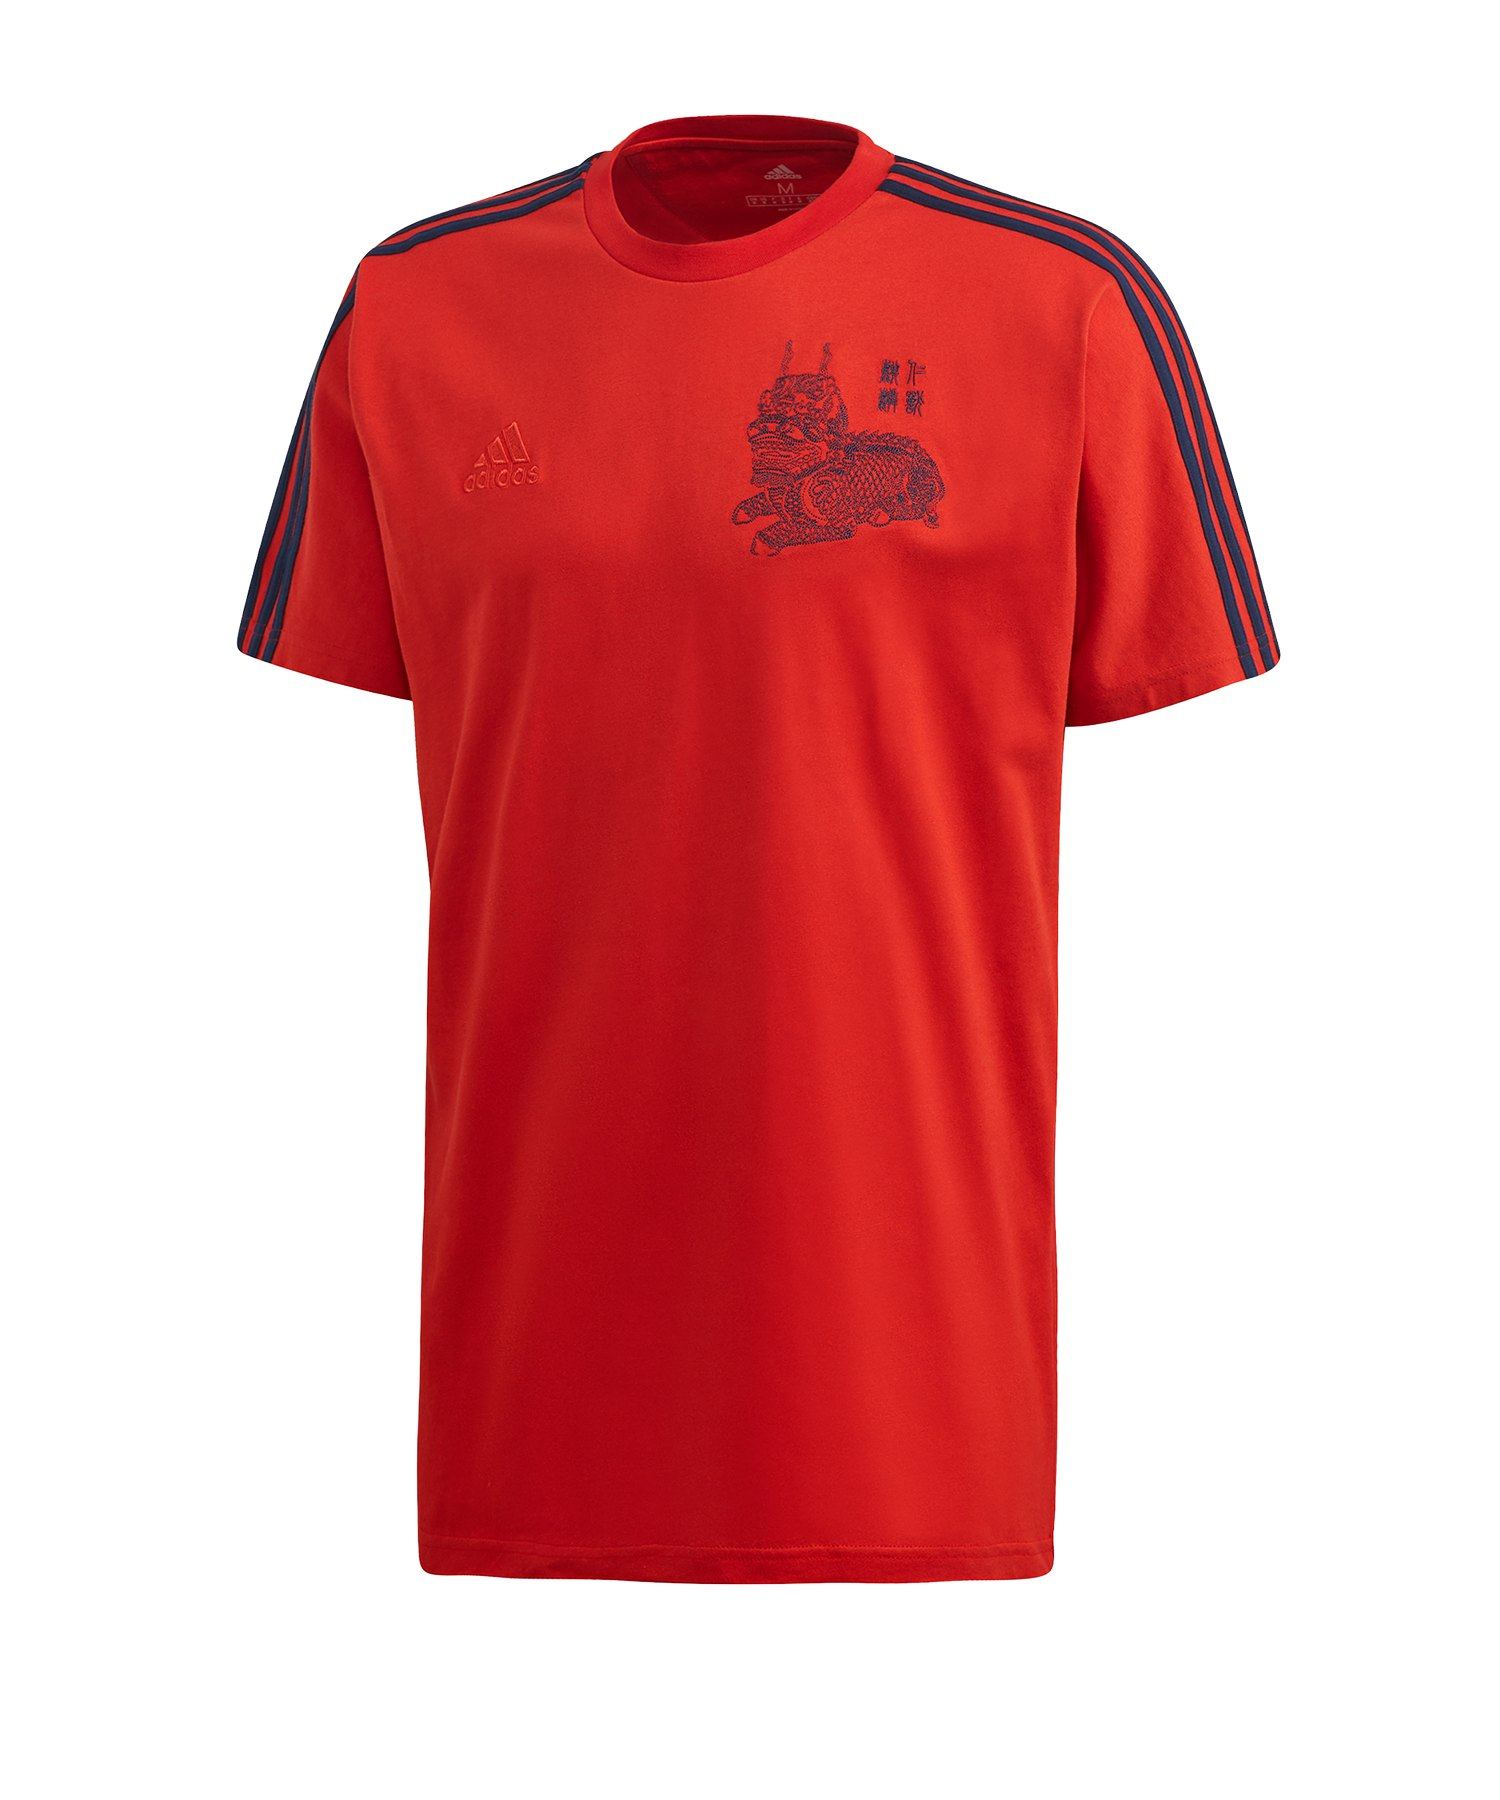 adidas FC Bayern München CNY Tee T-Shirt Rot - rot